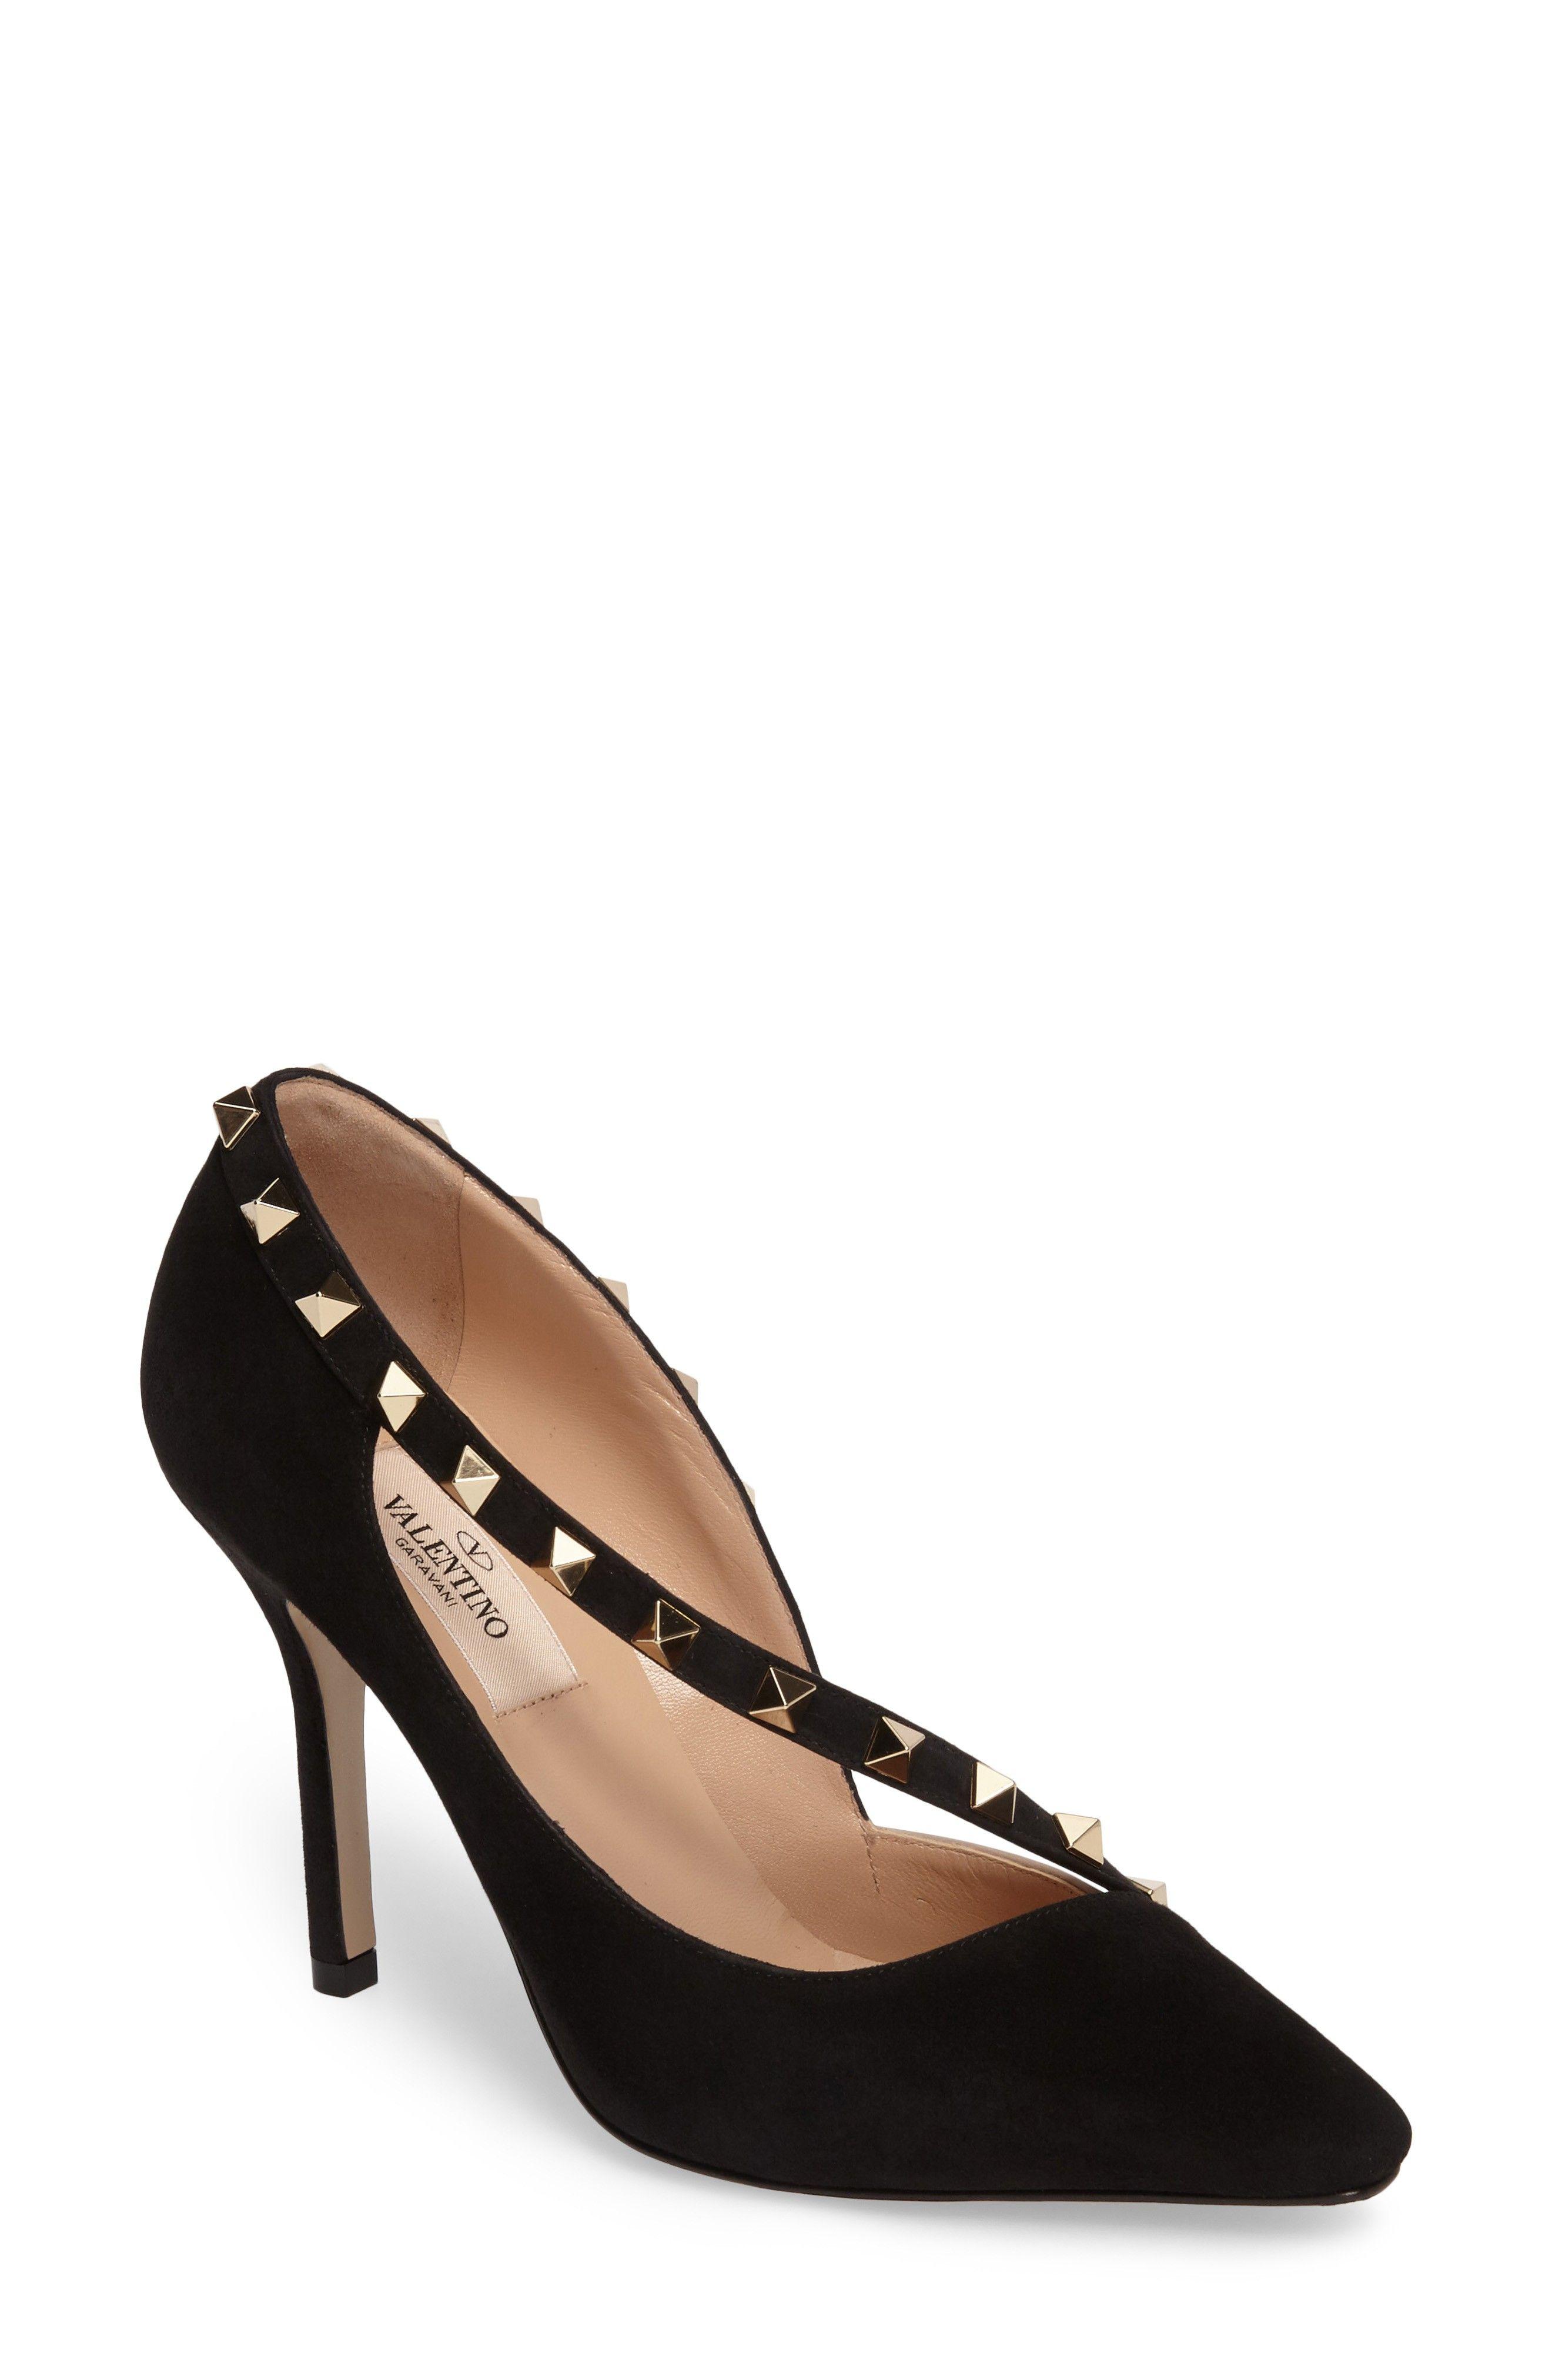 Valentino Designer Shoes, Rockstud d'Orsay Leather Mid Heel Pumps